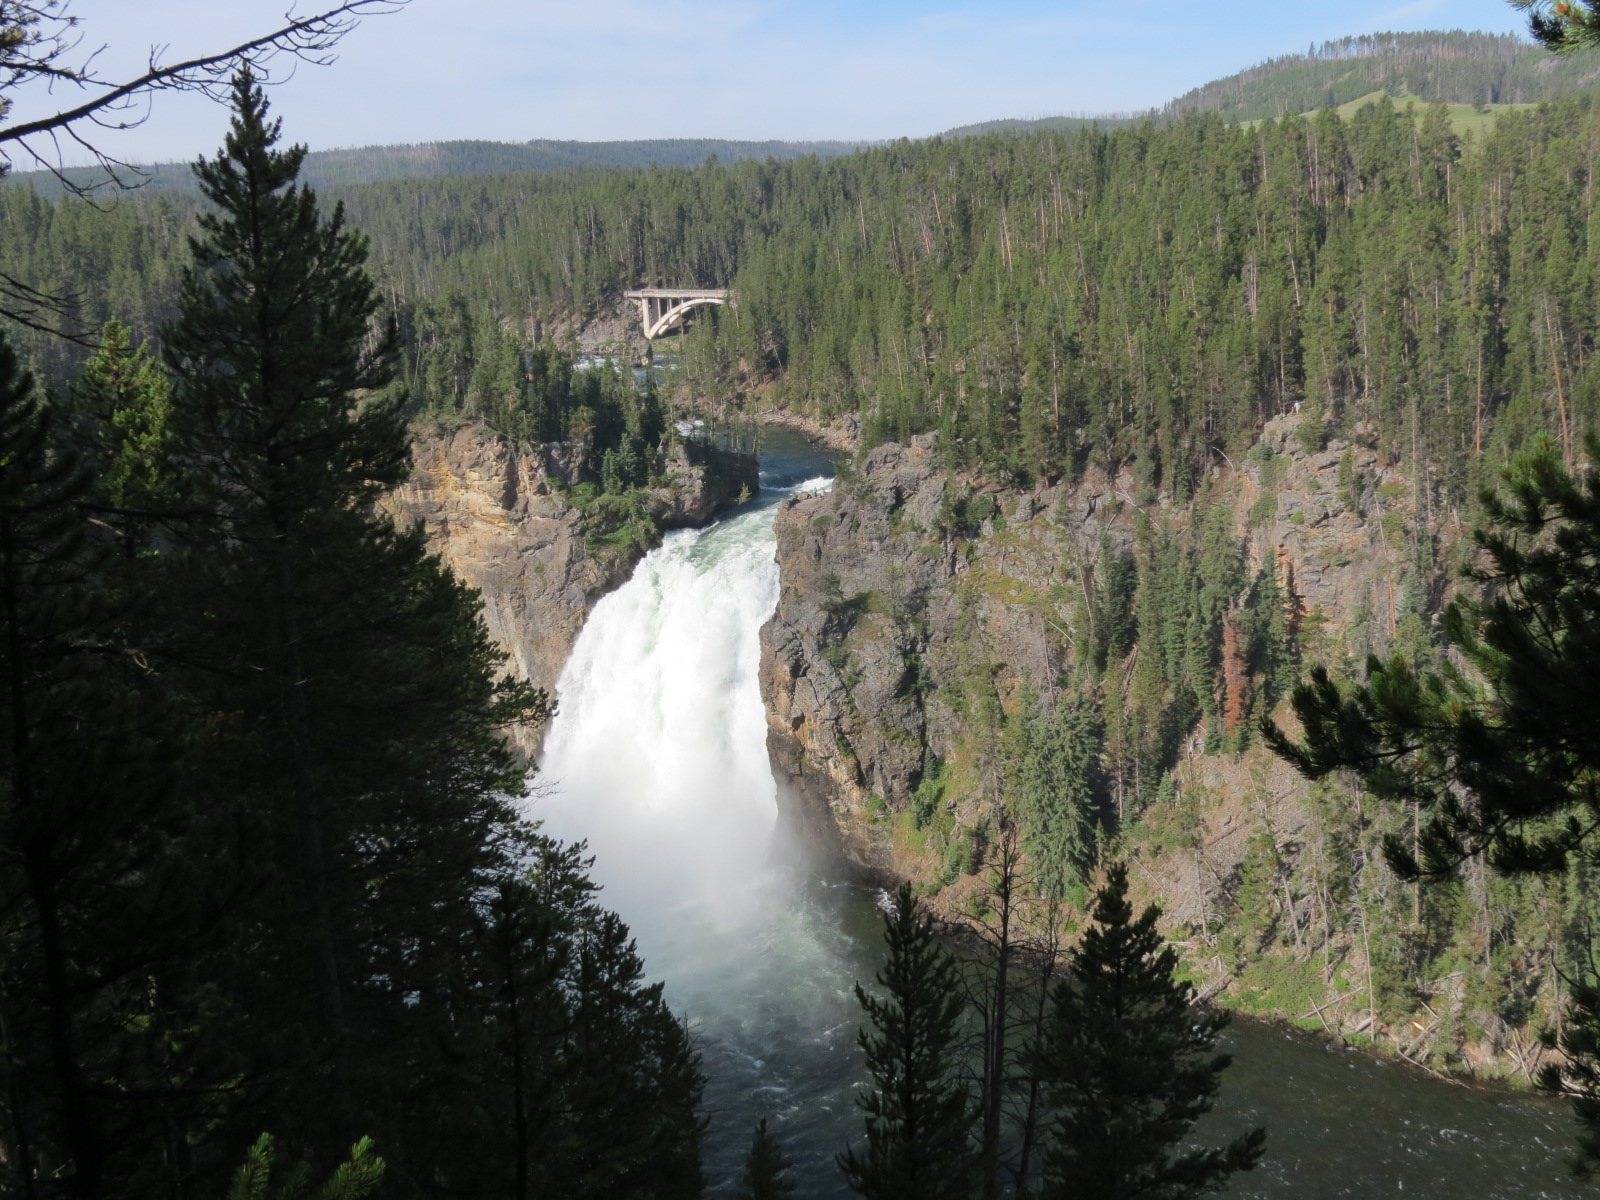 Upper Falls, Canyon Village area of Yellowstone